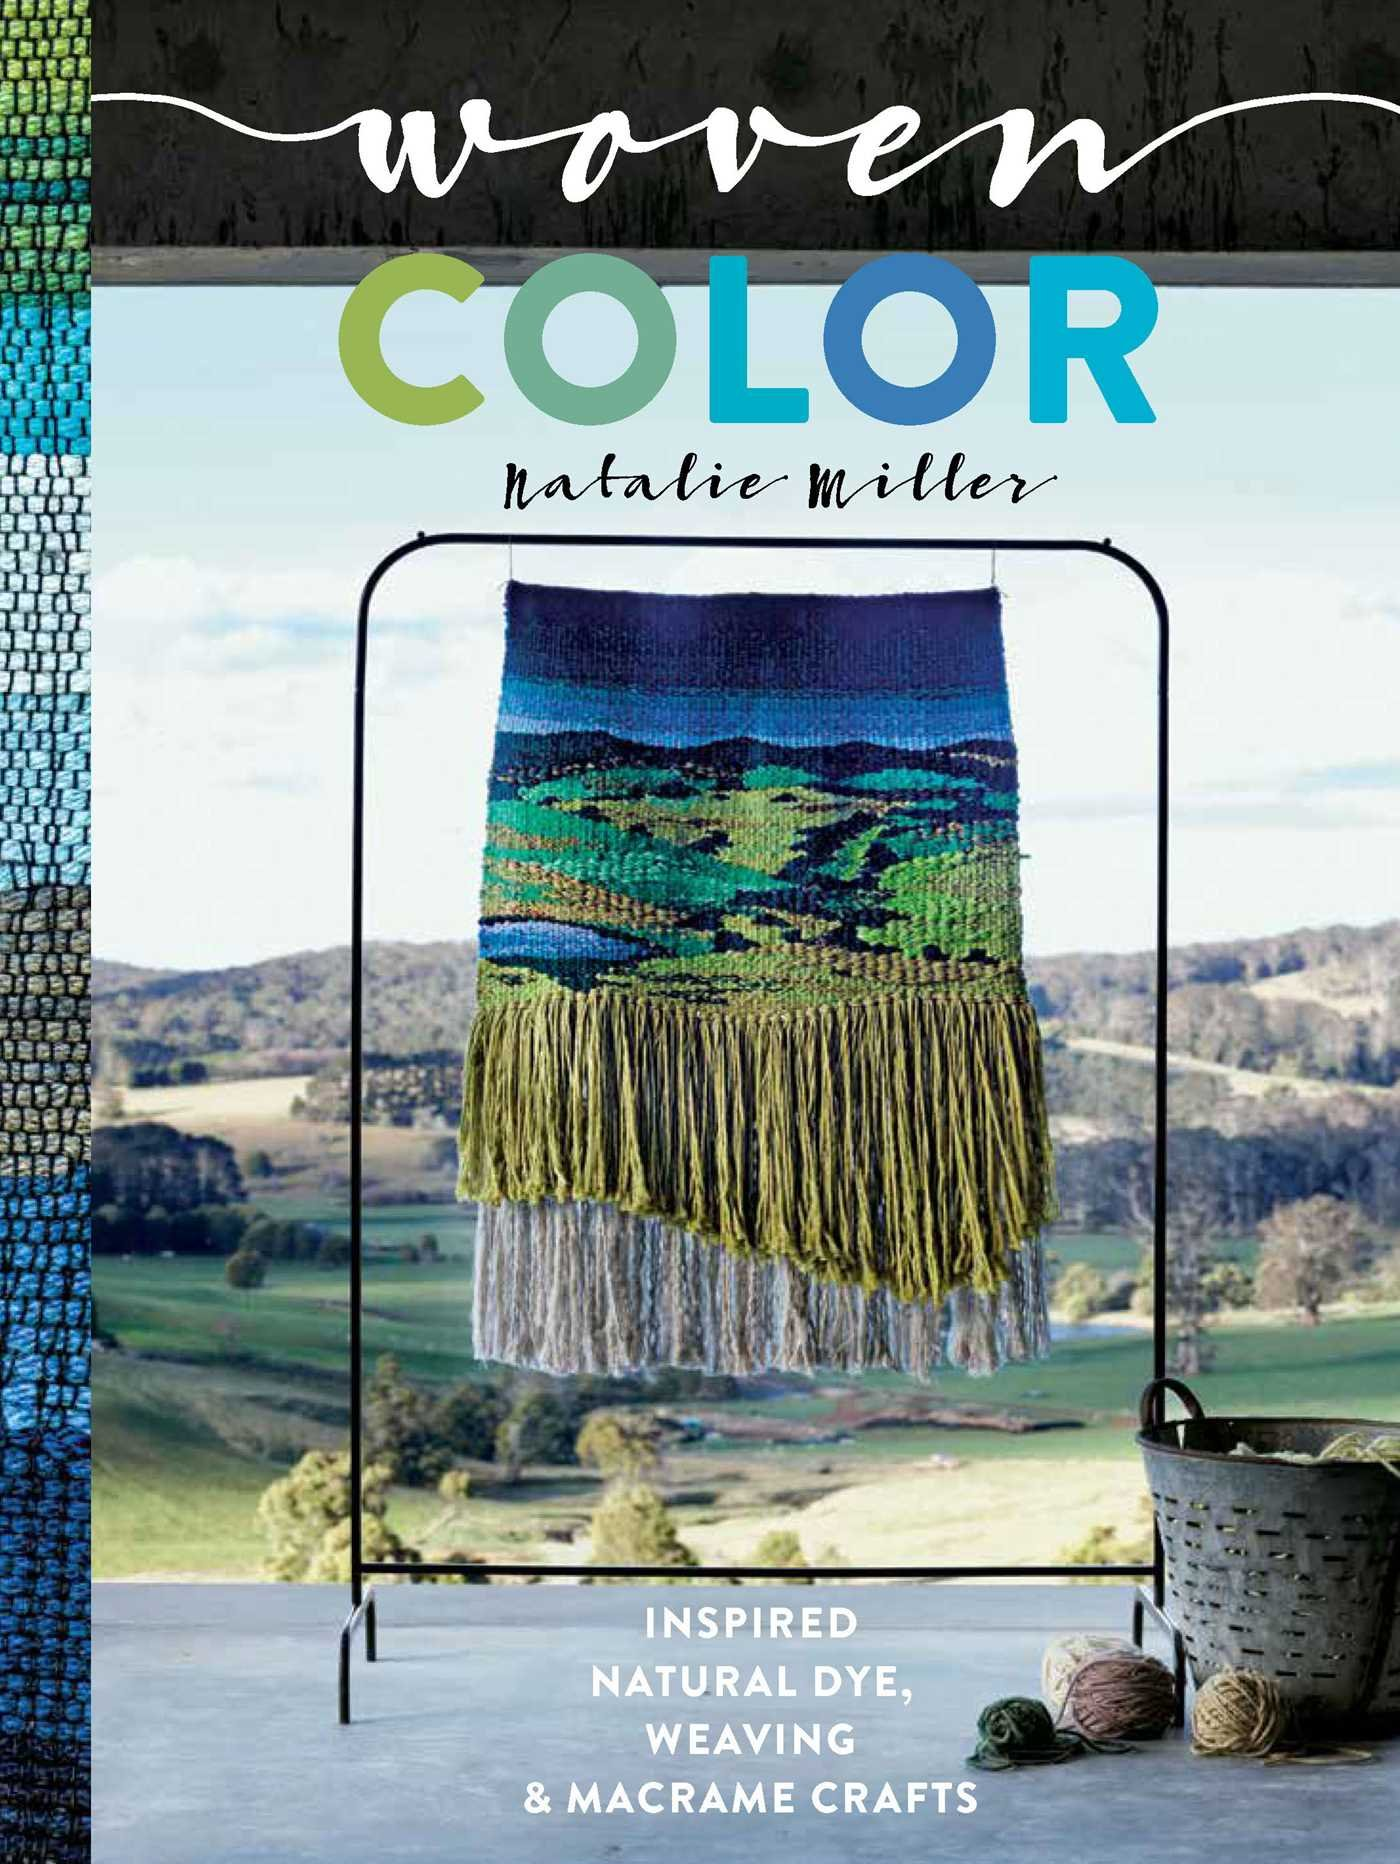 Woven Color: Inspired Natural Dye, Weaving & Macramé Crafts